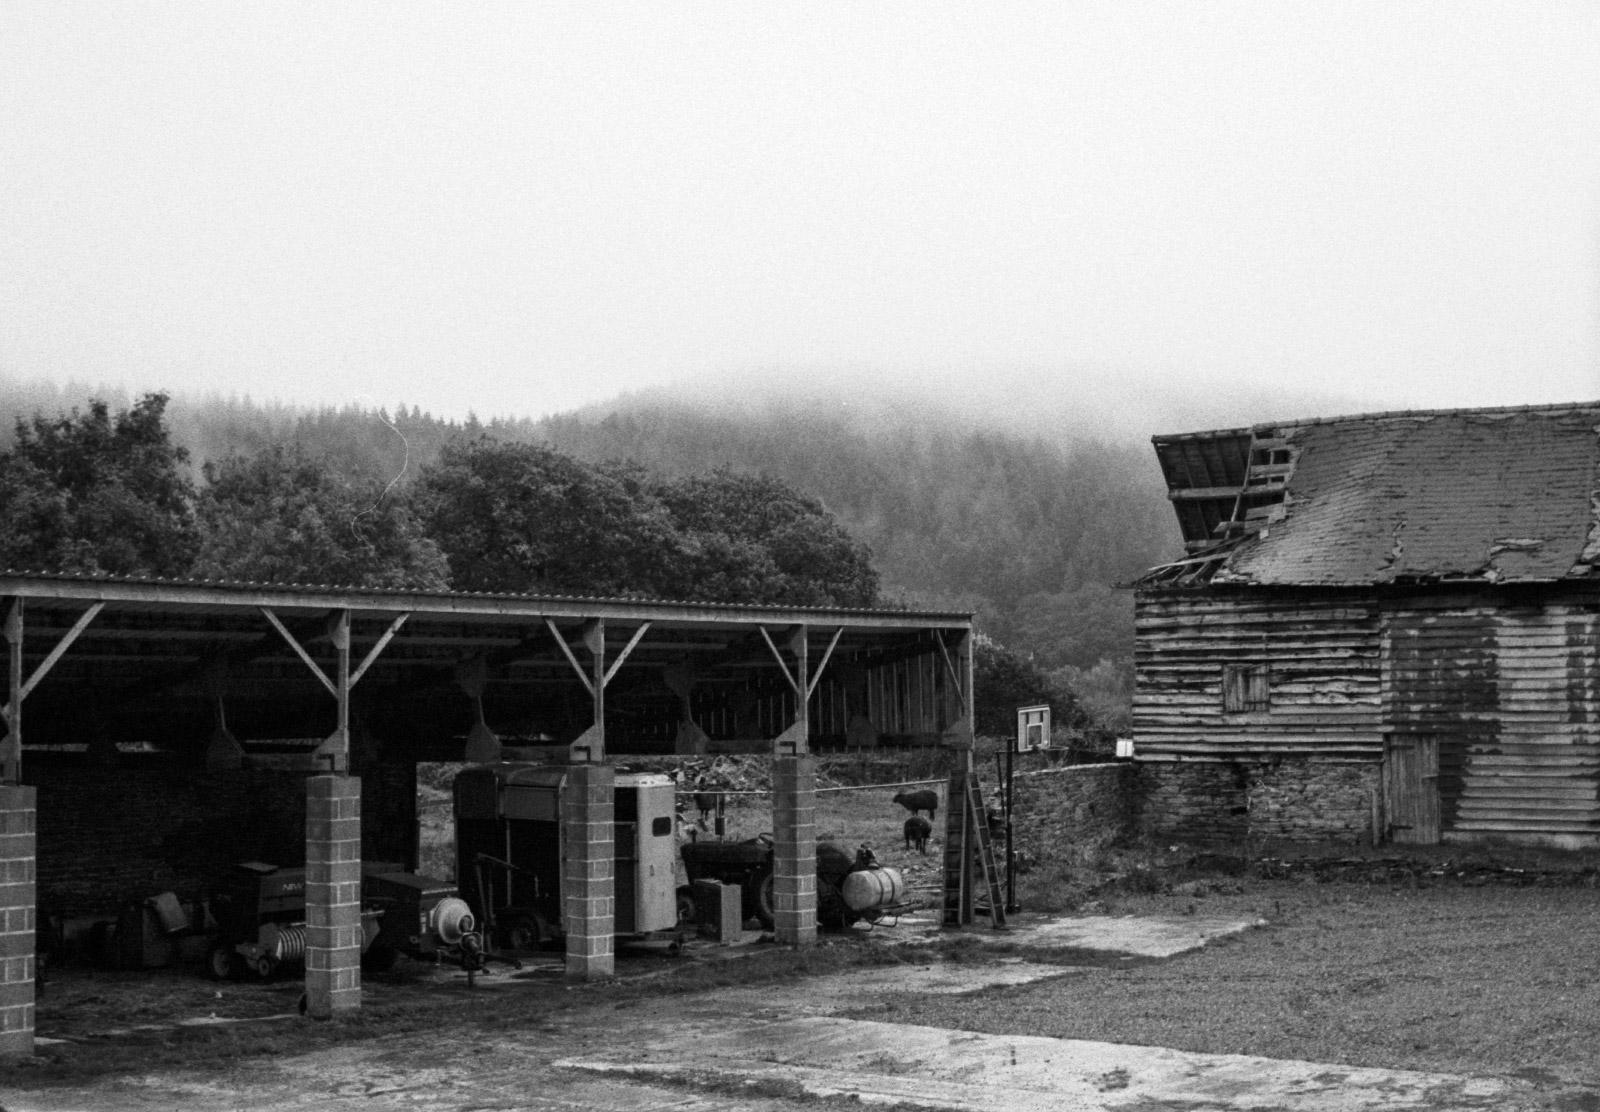 Rickety old barn